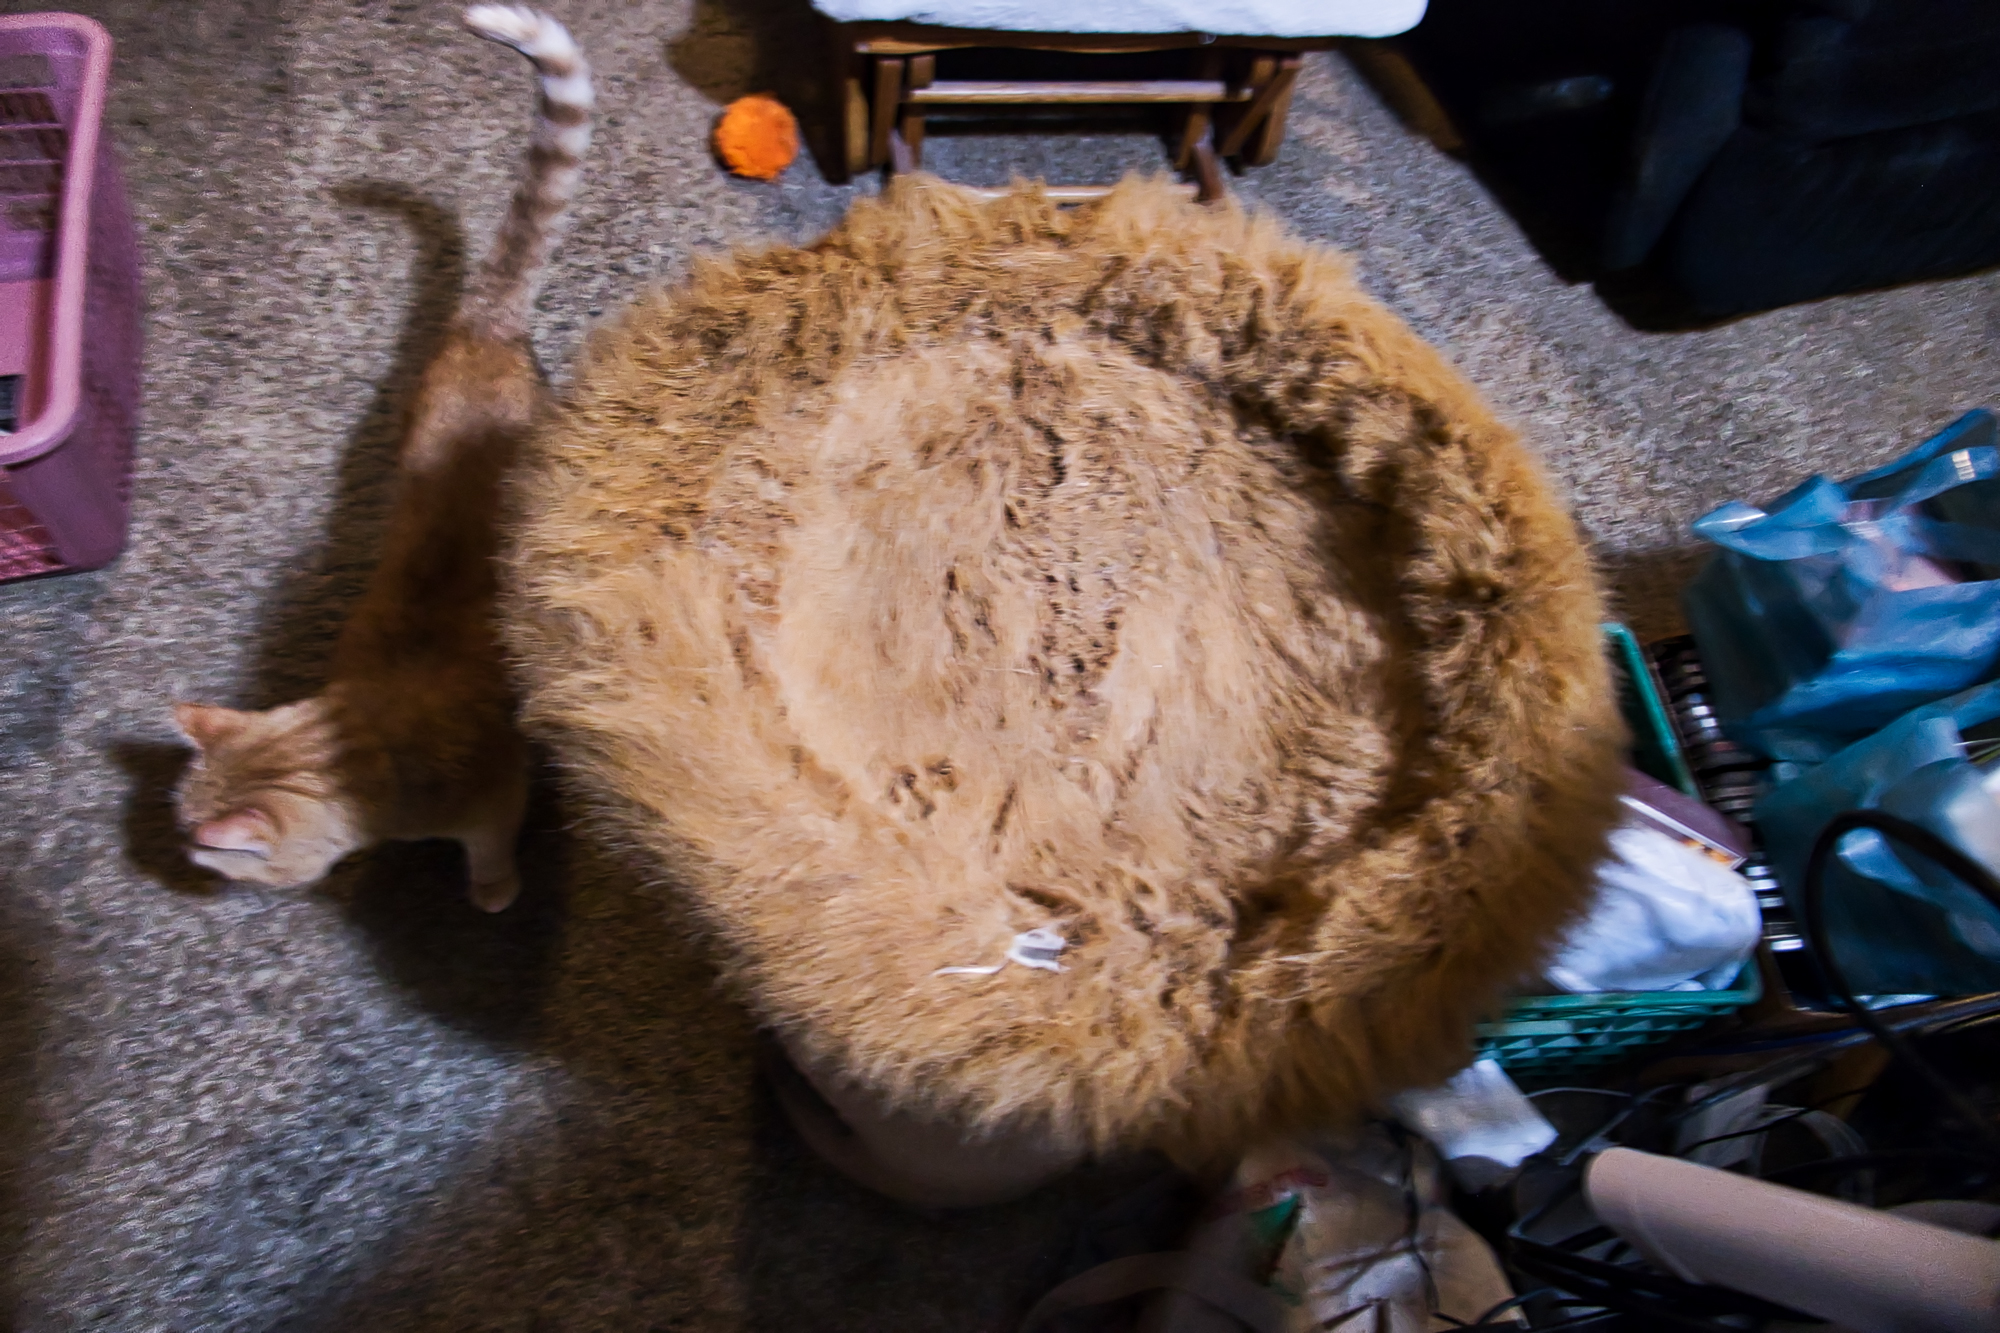 Meyer's Fox Fur Bedding